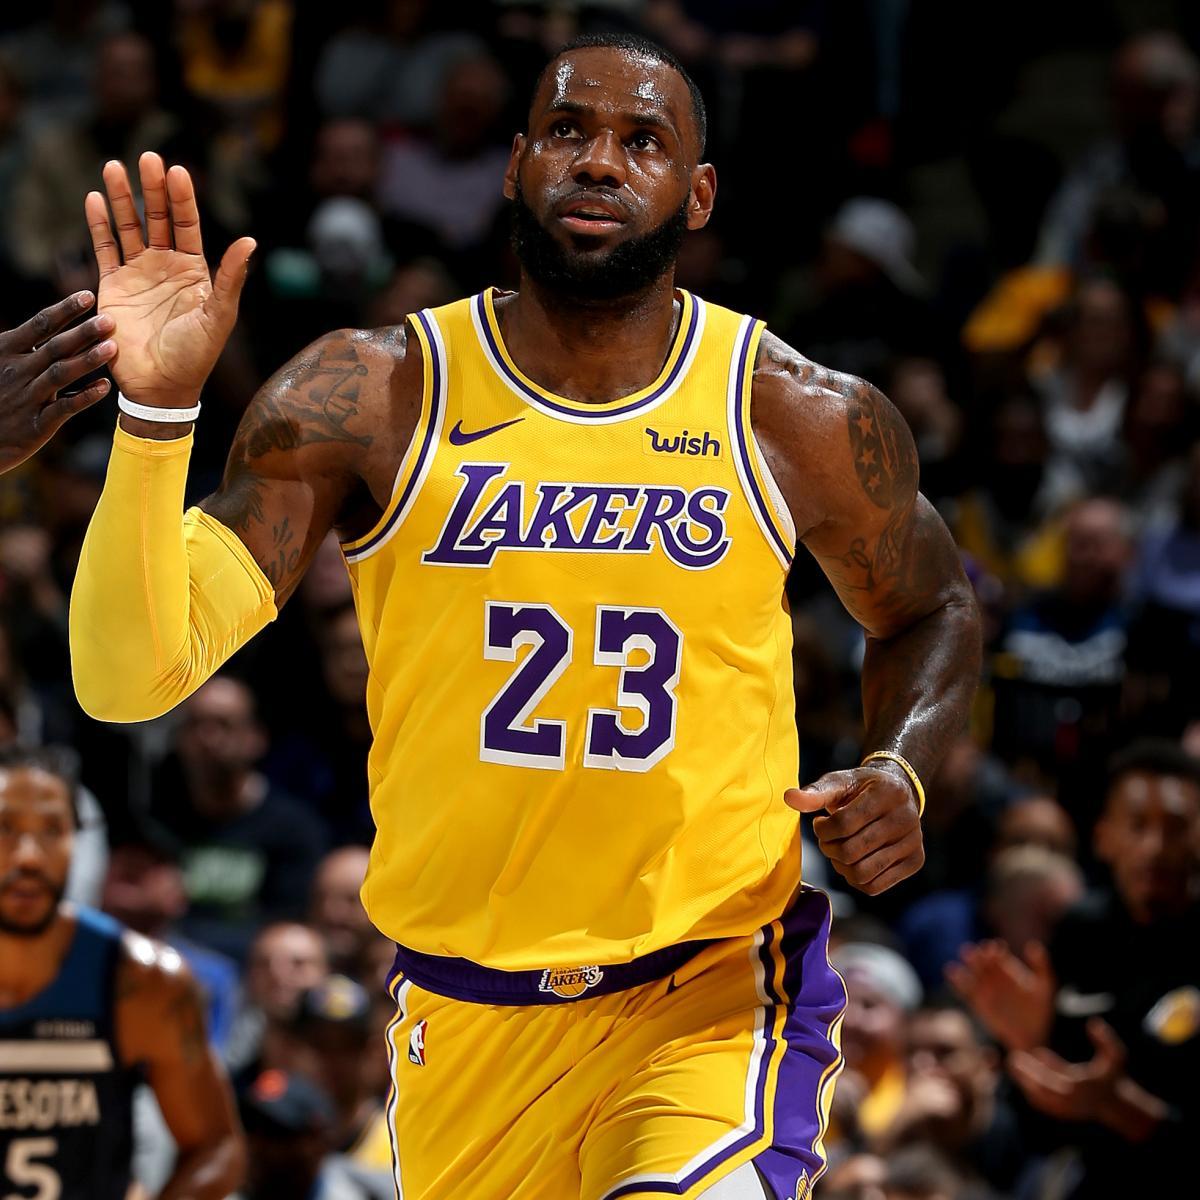 LeBron James Passes Wilt Chamberlain For 5th On NBA All